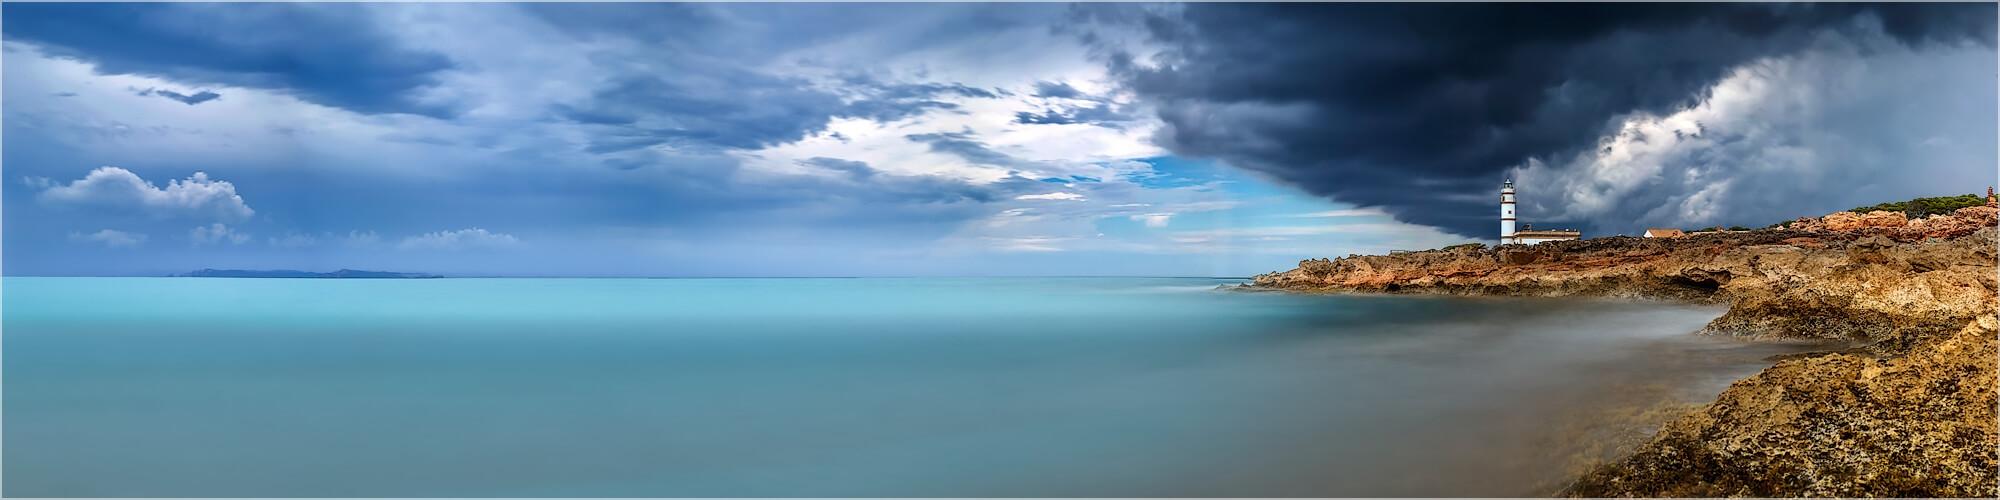 Panoramabild Gewitterstimmung Ses Salinas Mallorca